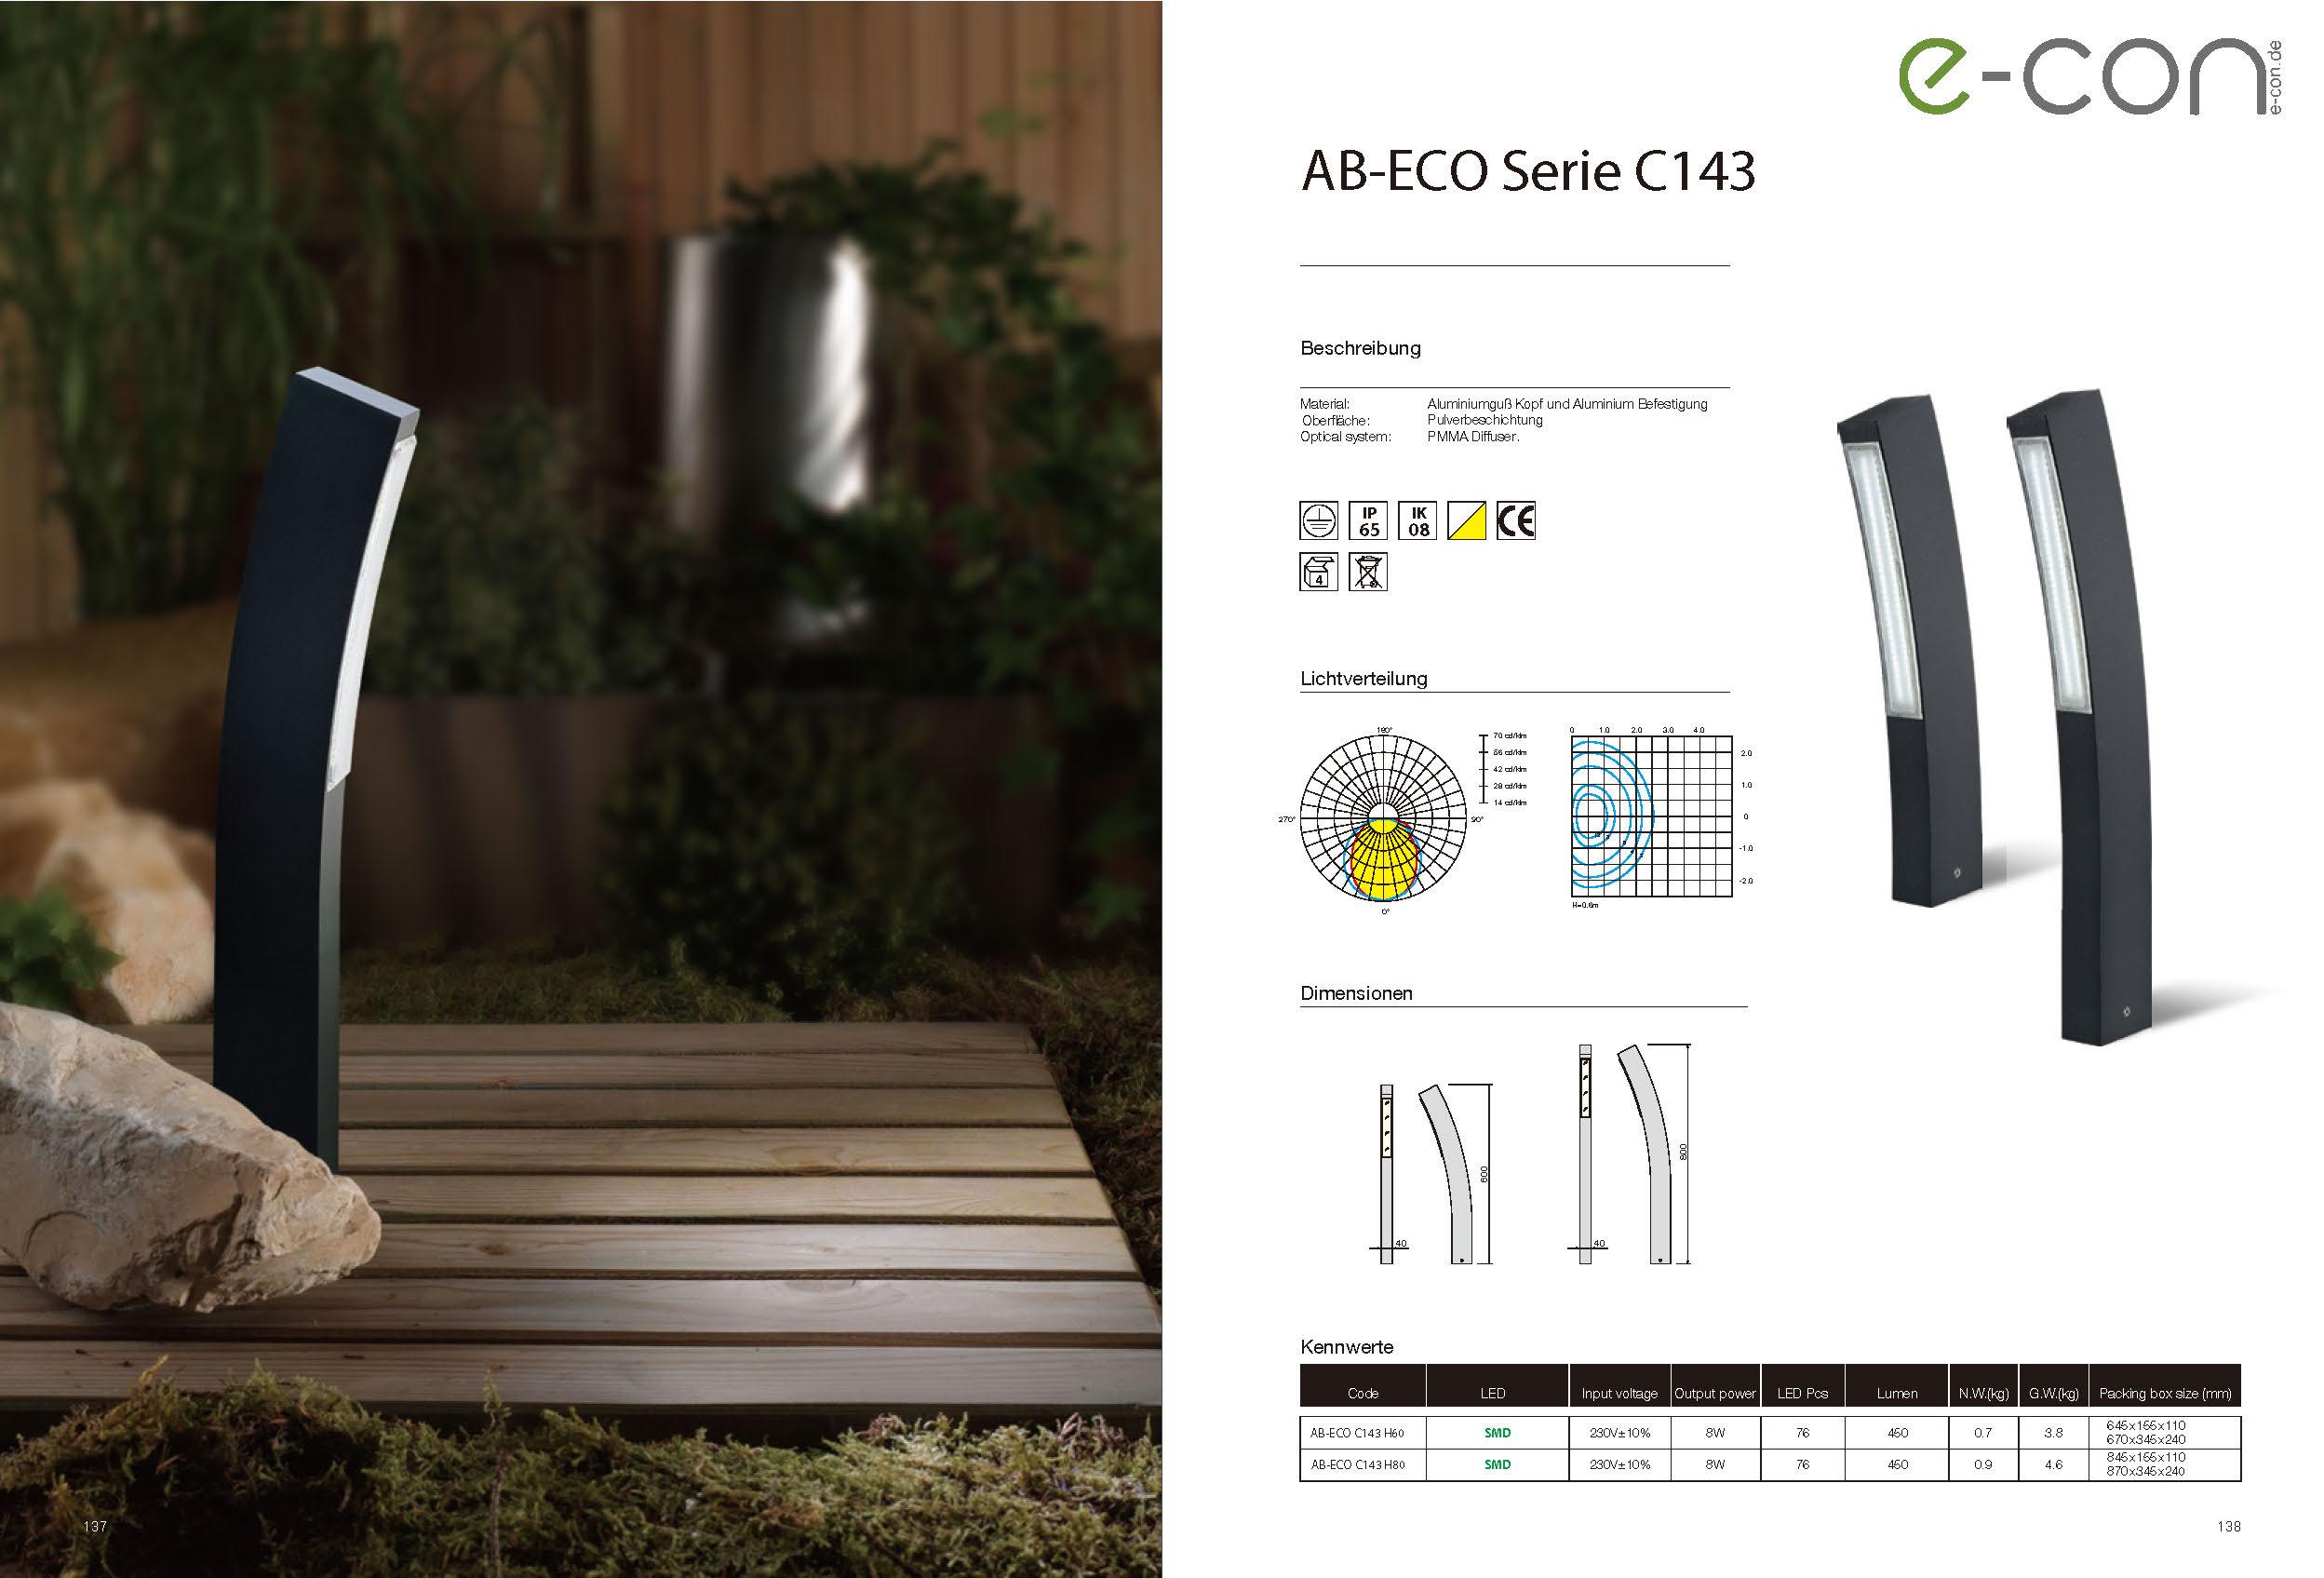 AB-ECO C143 Beschreibung